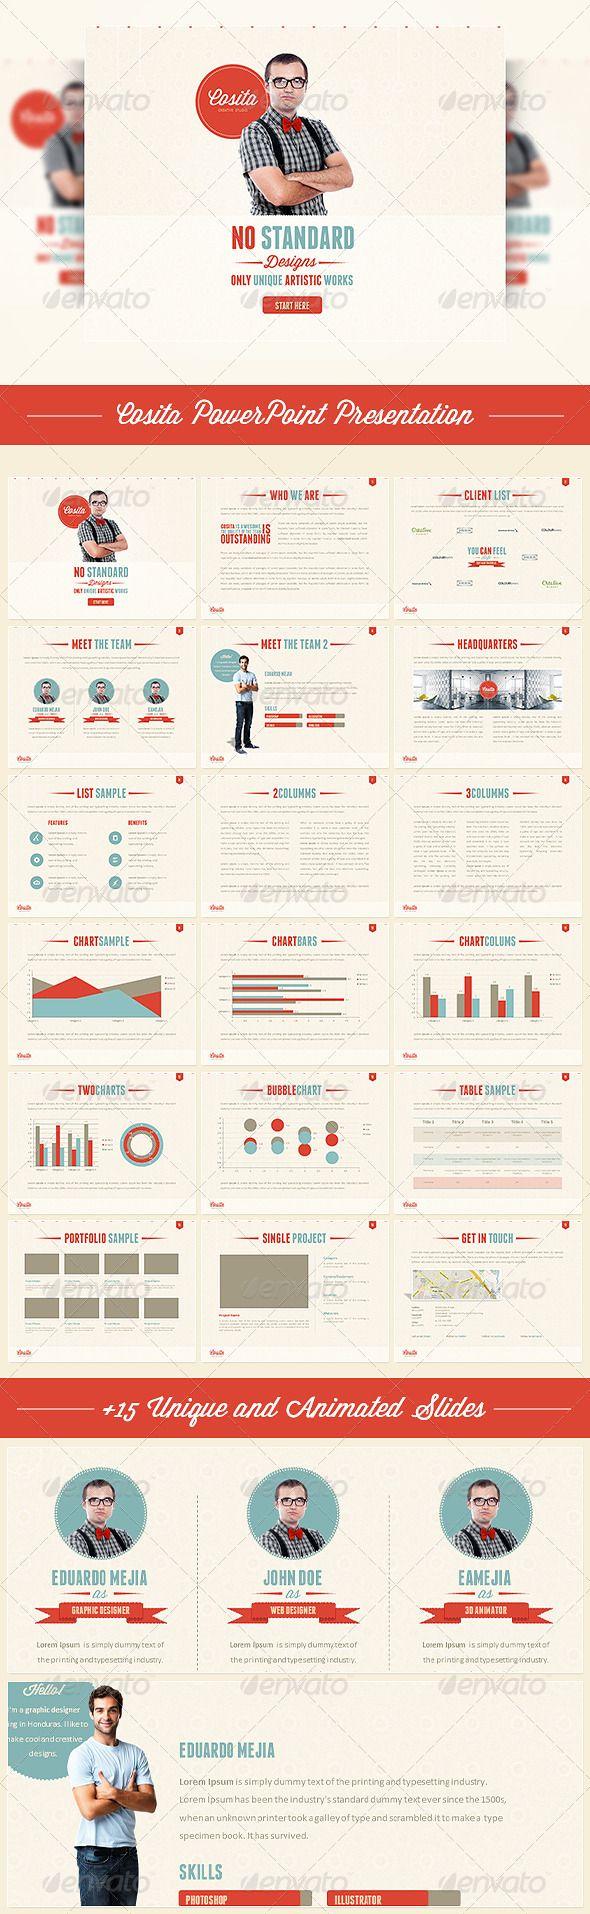 Cosita PowerPoint Presentation for media kit?